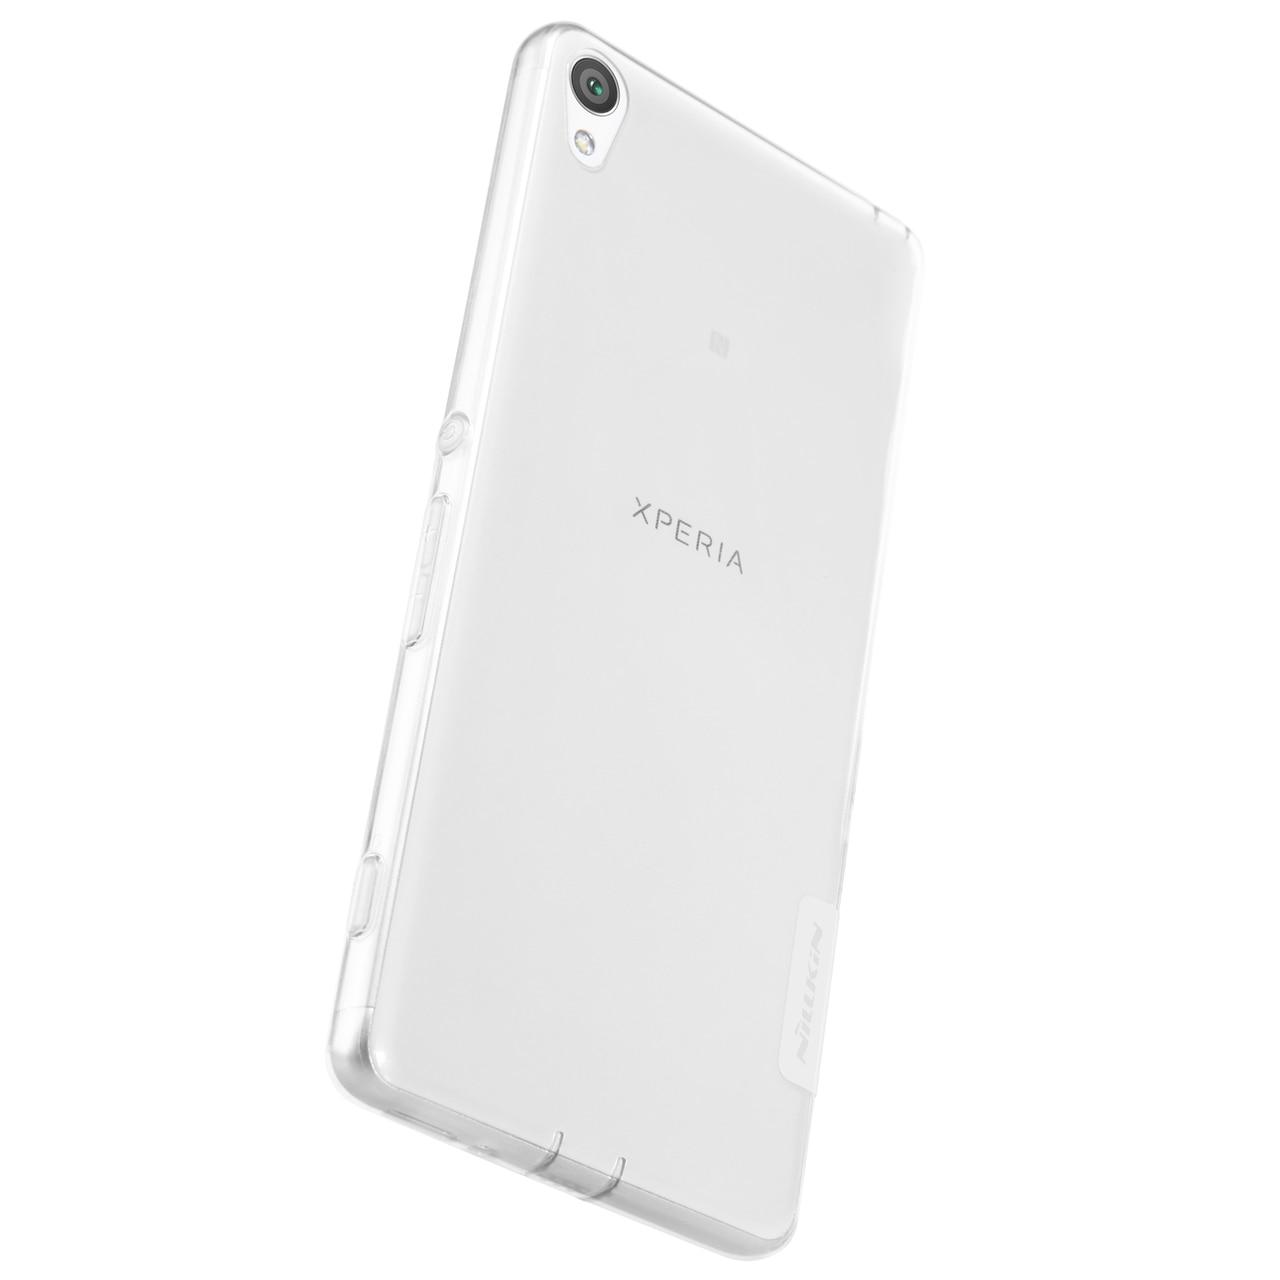 Sony Xperia XA Premium Silicon Cover by Nillkin - Transparent